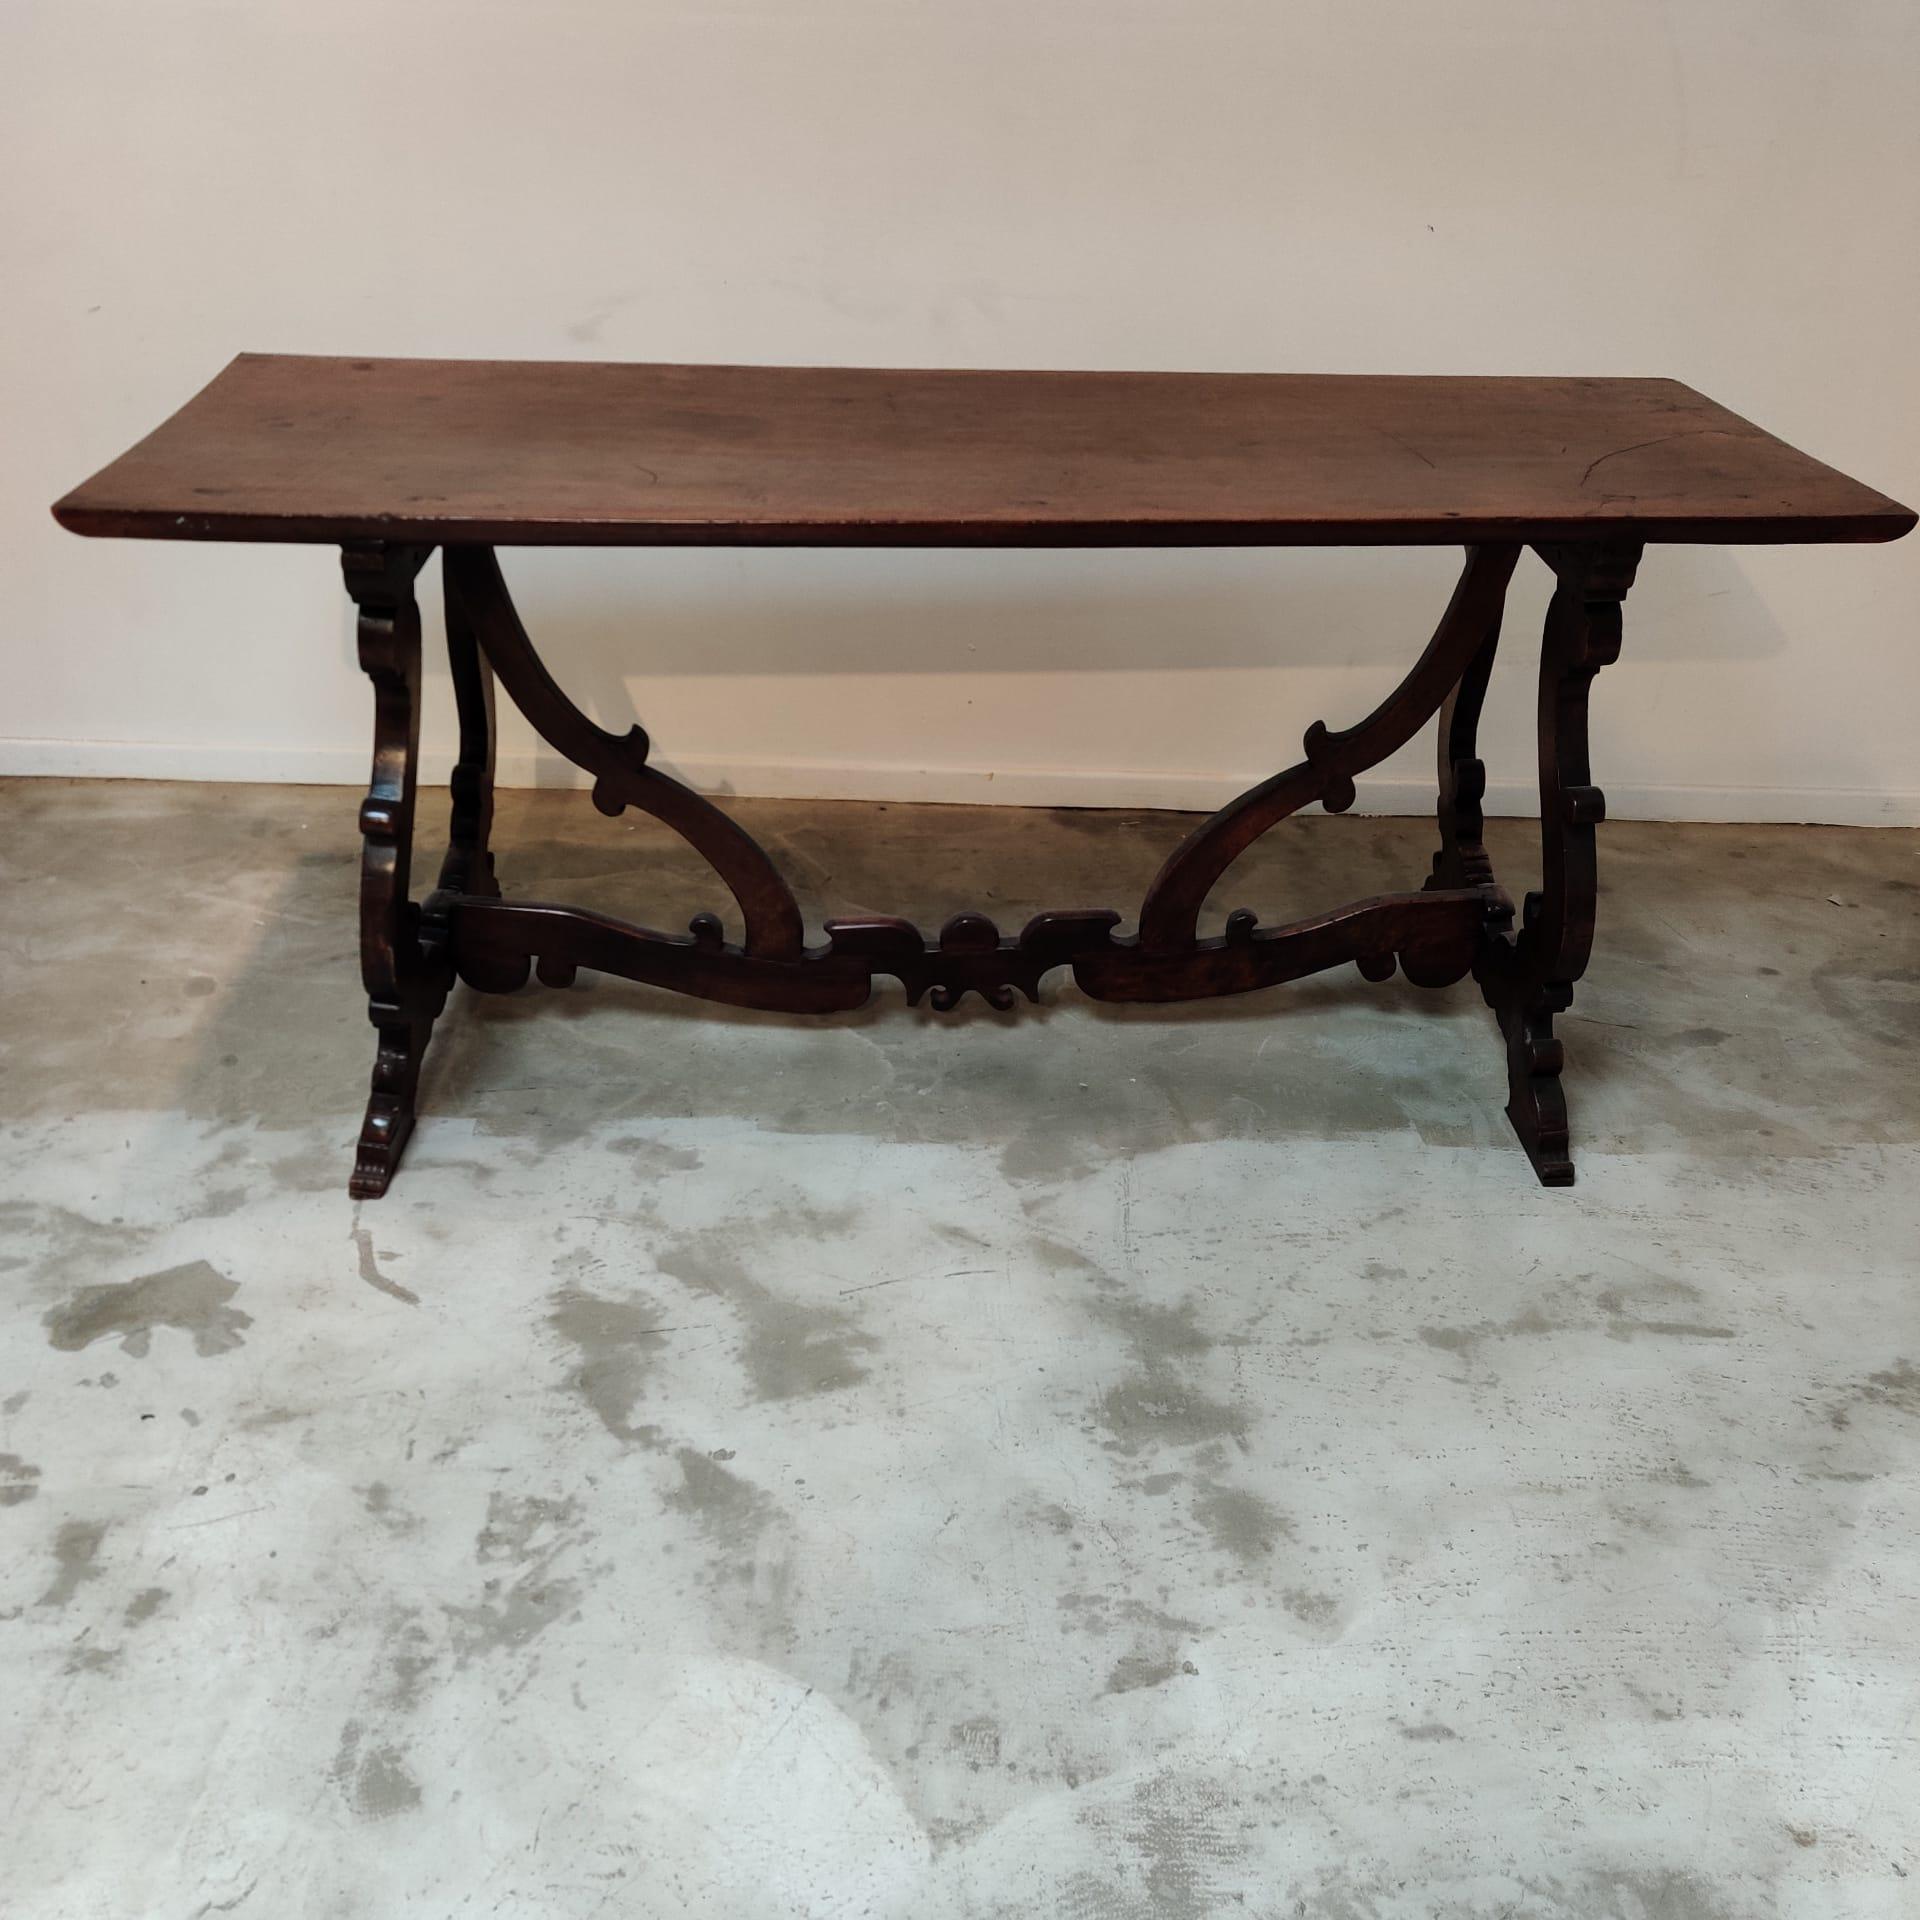 Italian XIXth century table